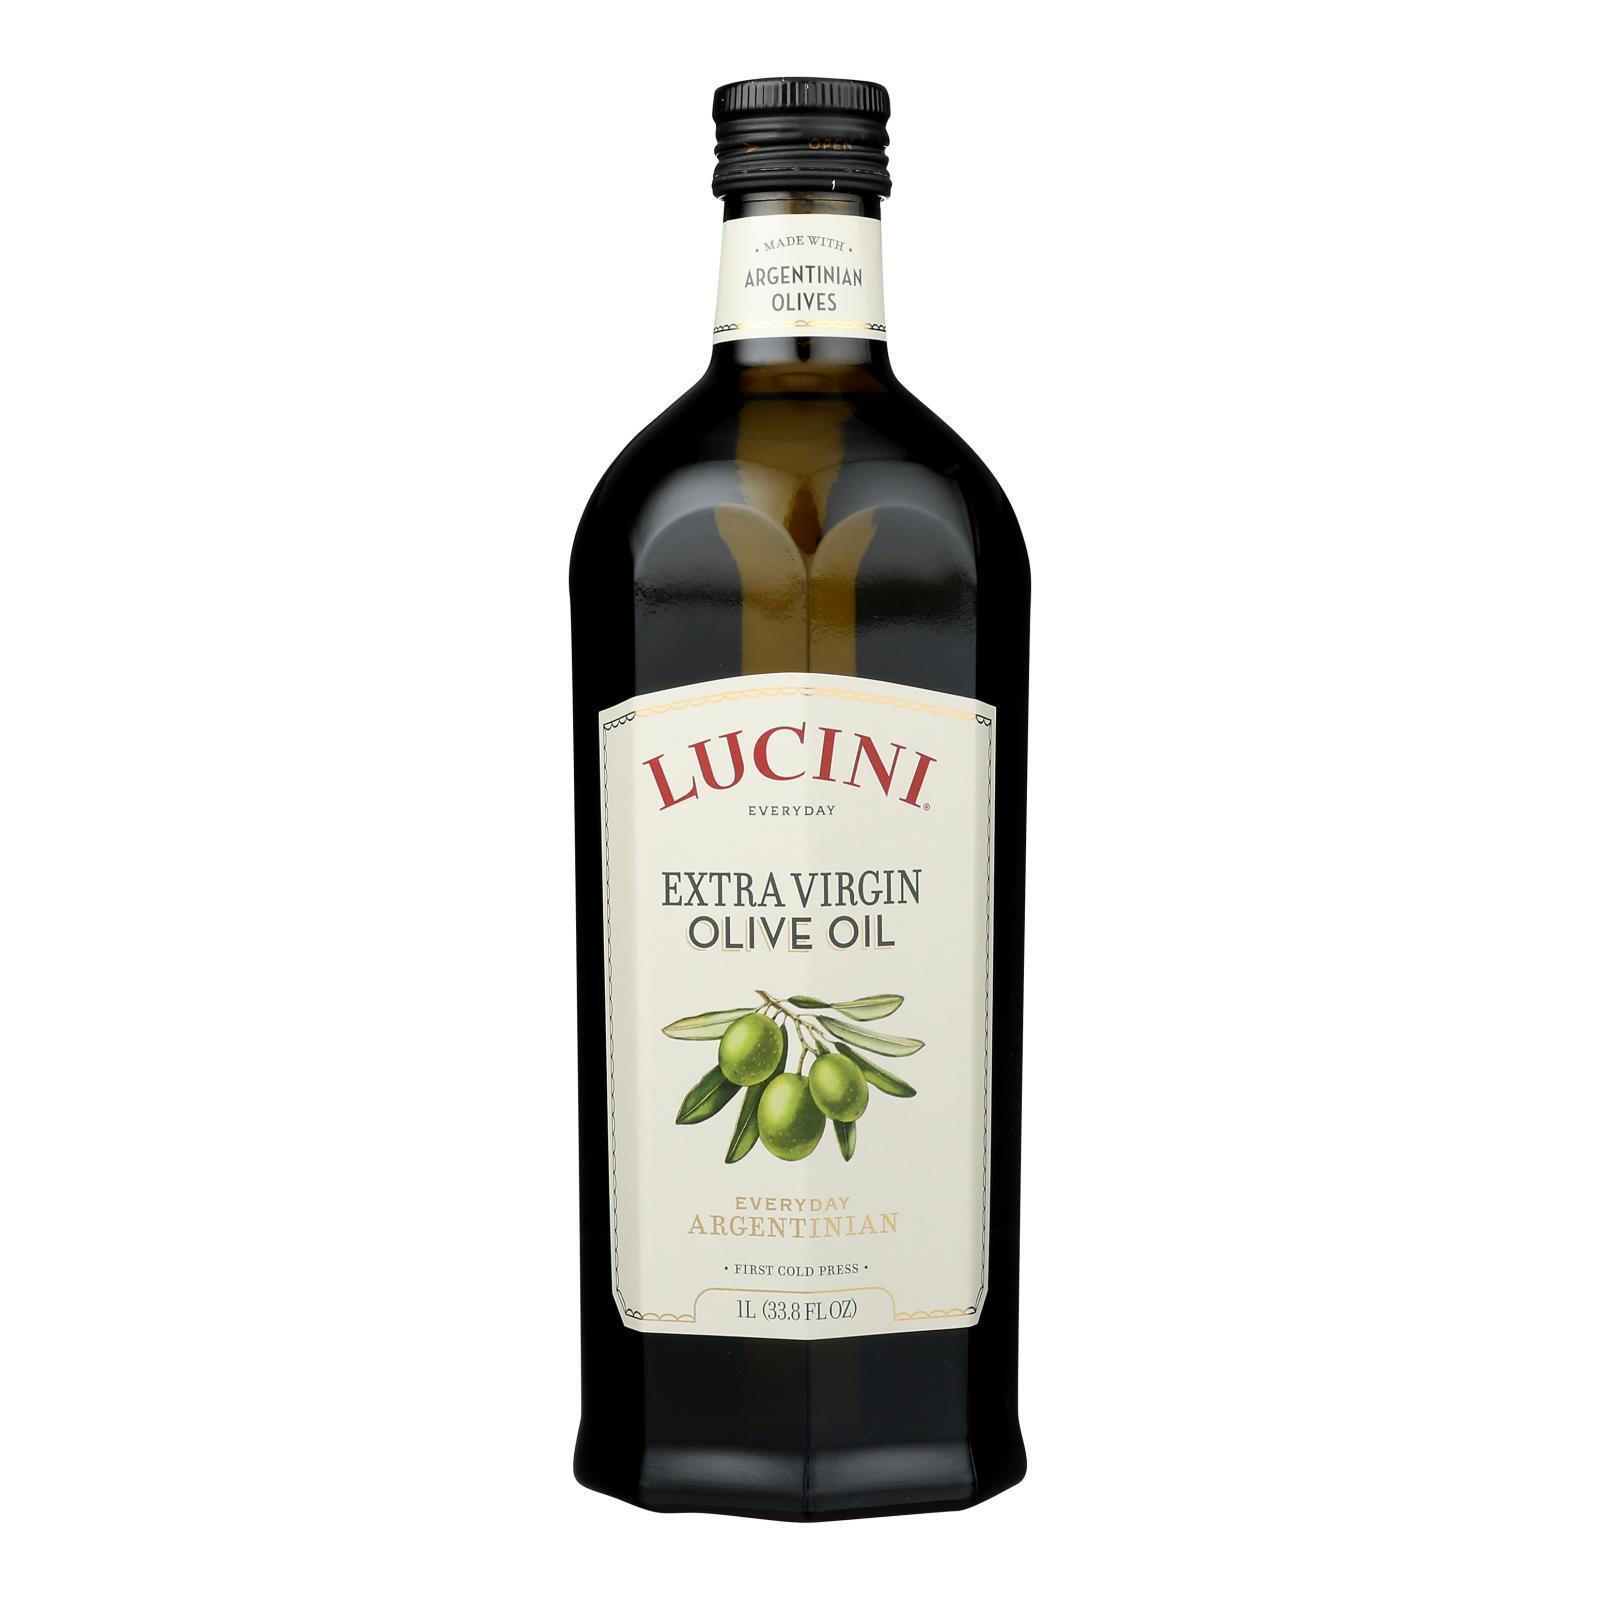 Lucini Italia Select Extra Virgin Olive Oil - Case of 6 - 1 Liter